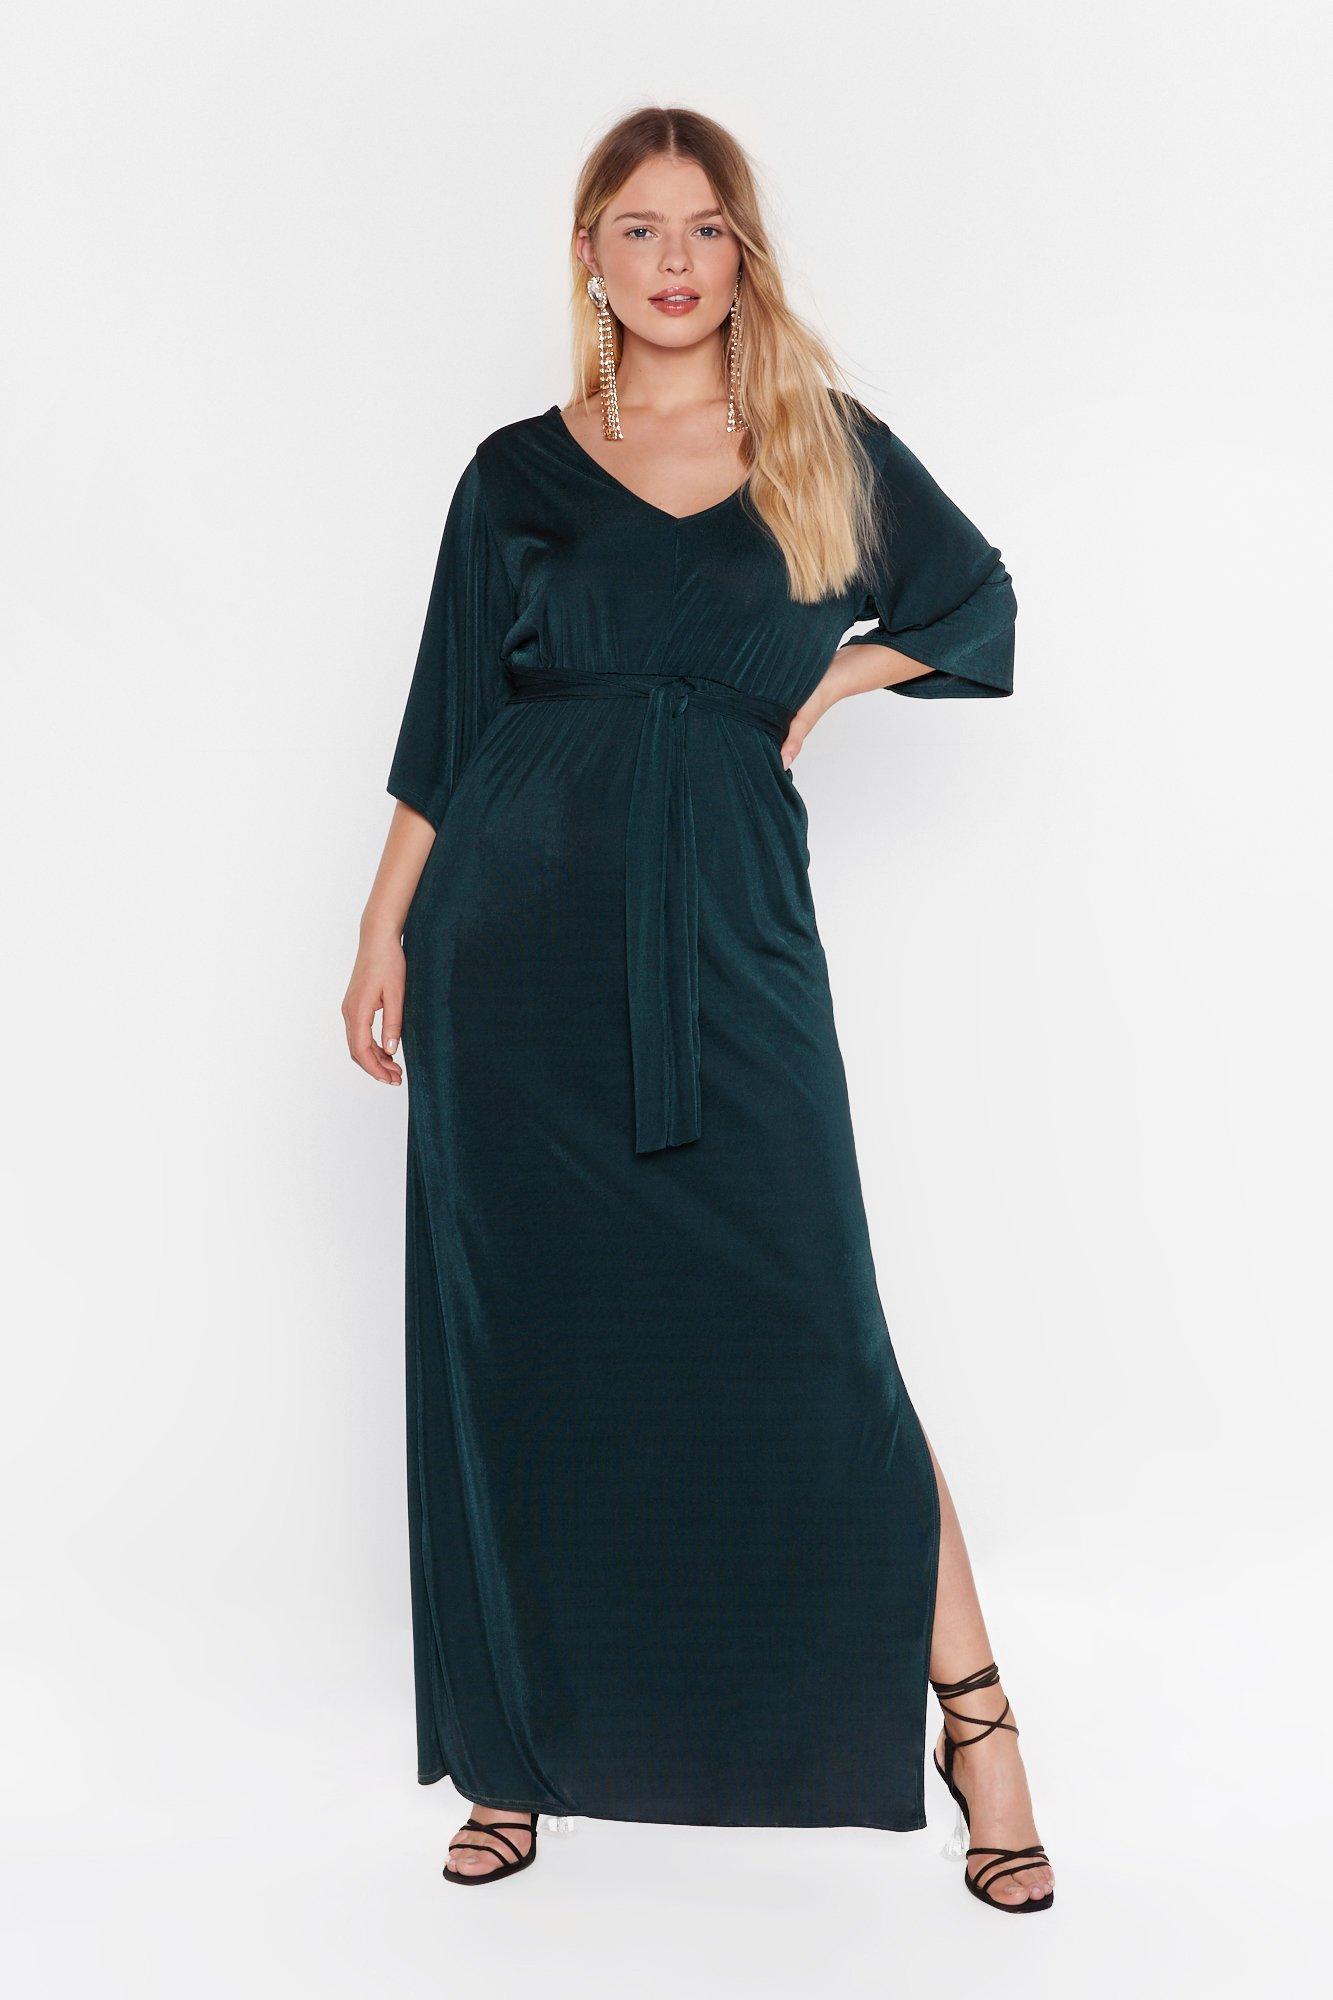 Image of Slit's a Close Call Plus Maxi Dress